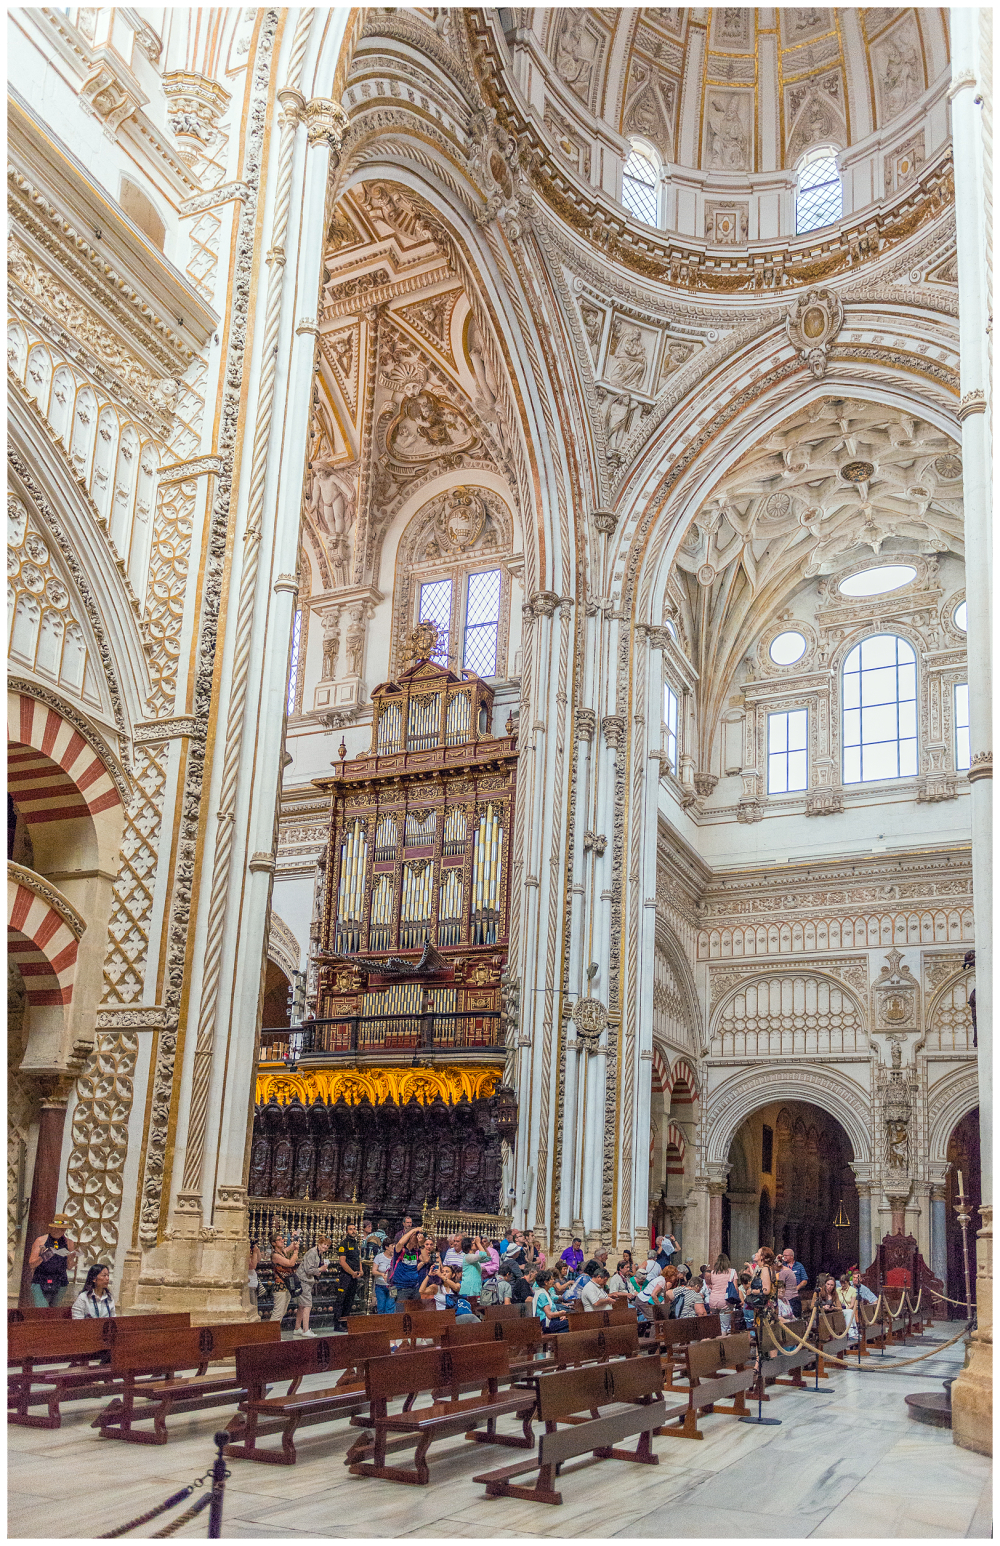 Mesquita Catedral Córdoba Spain